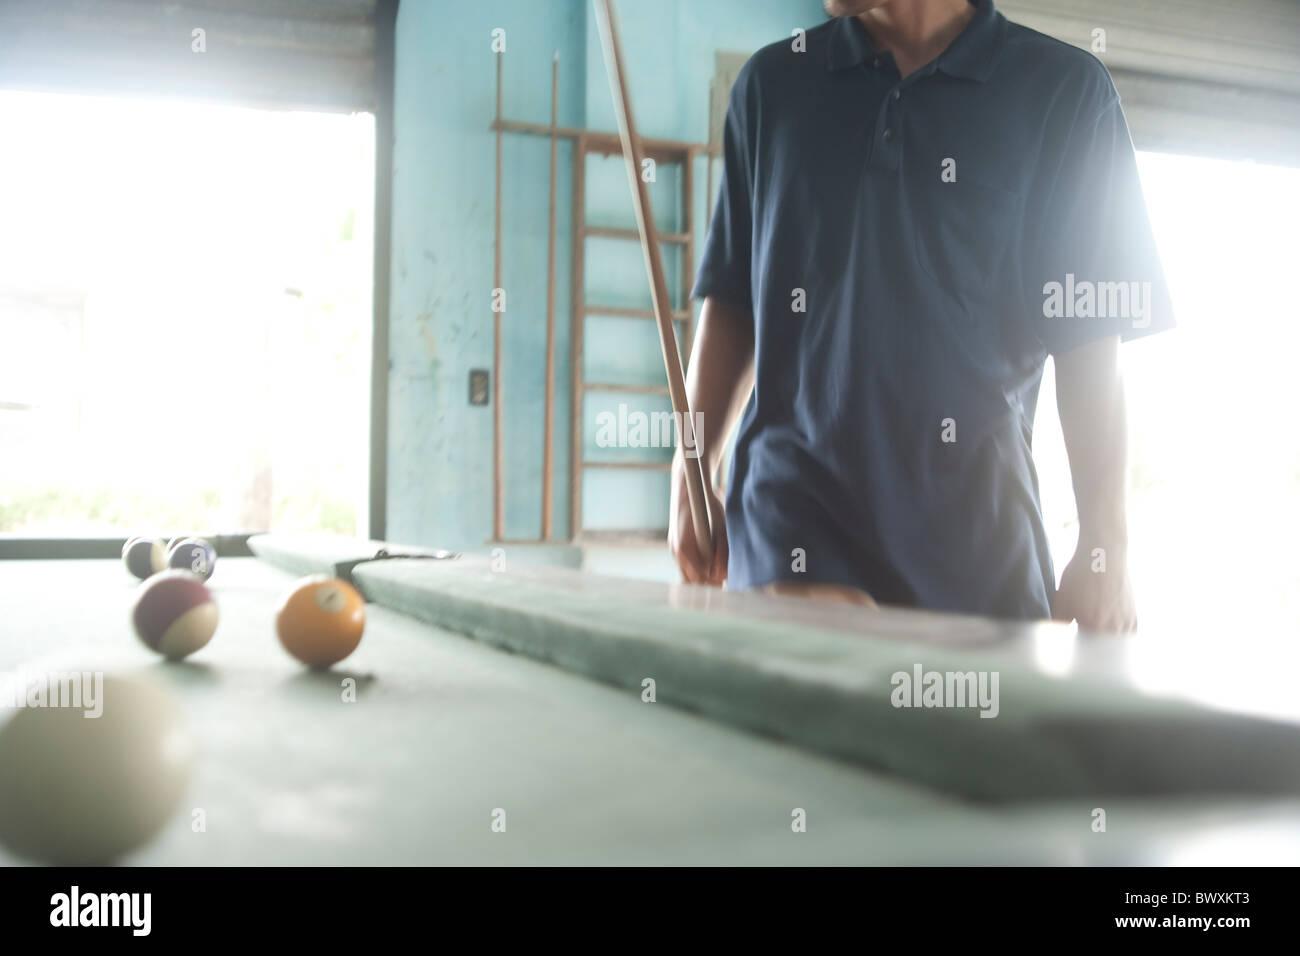 man playing billiards - Stock Image